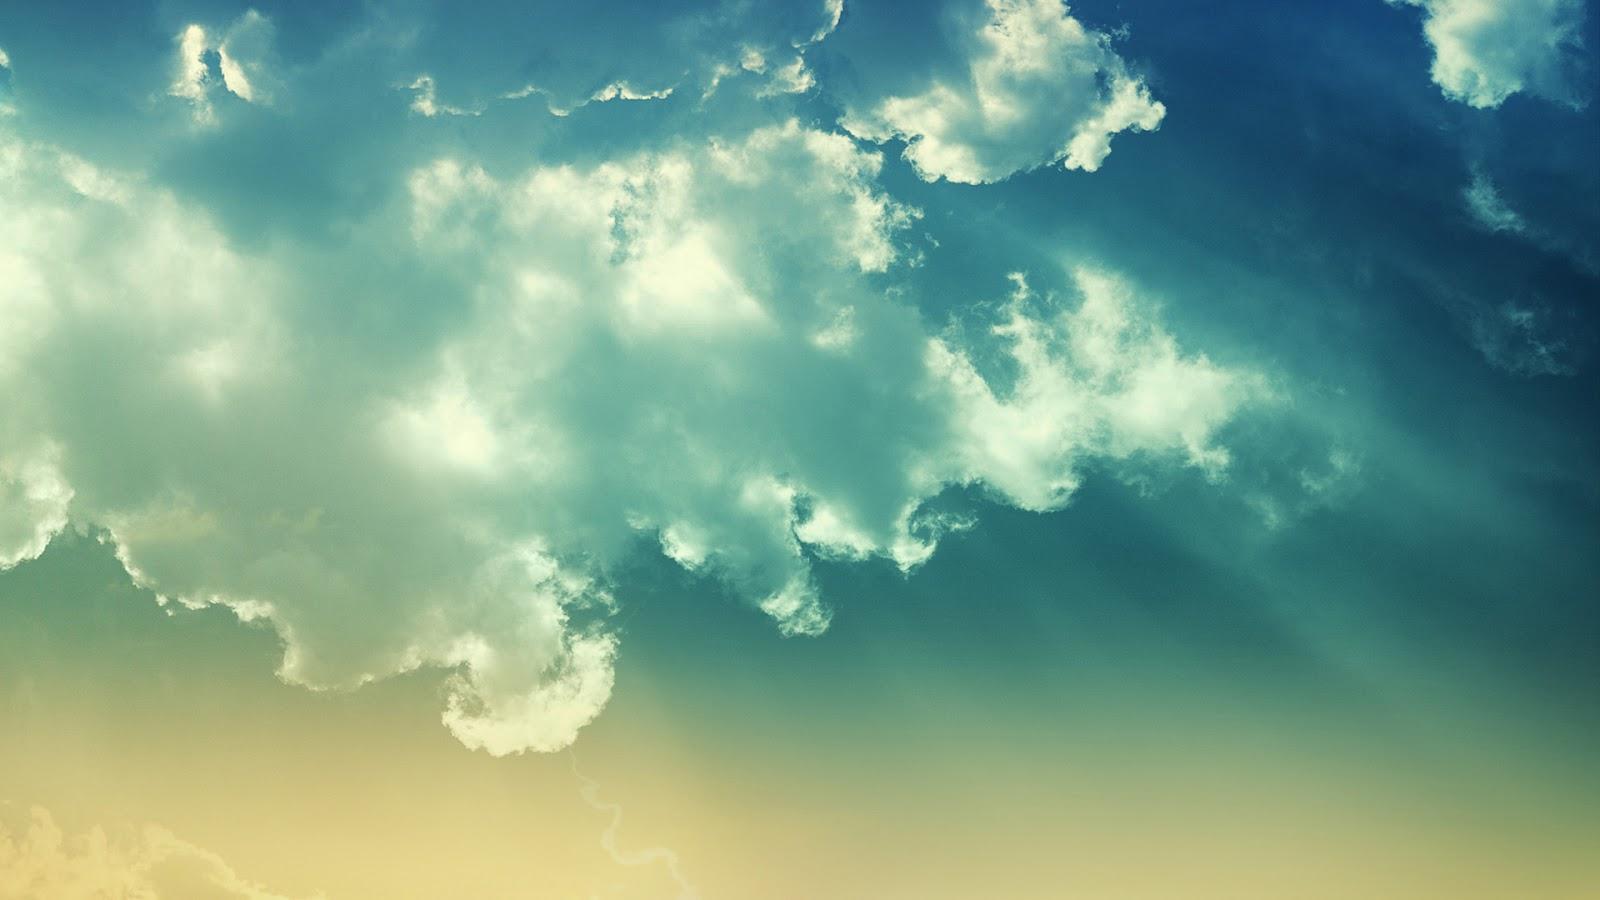 Blue White Clouds